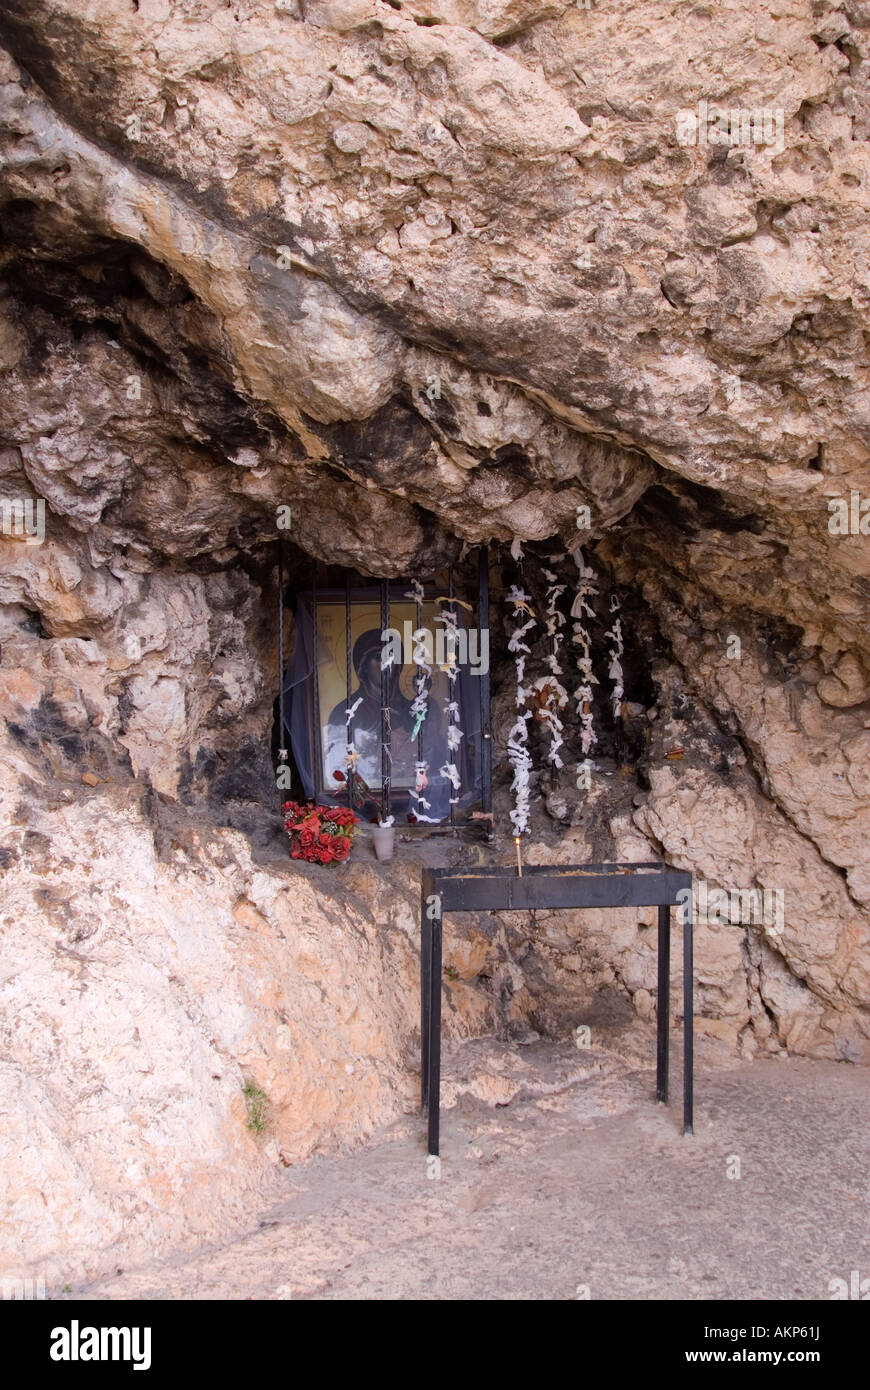 Shrine in the Miraculous Virgin Mary Church - Stock Image